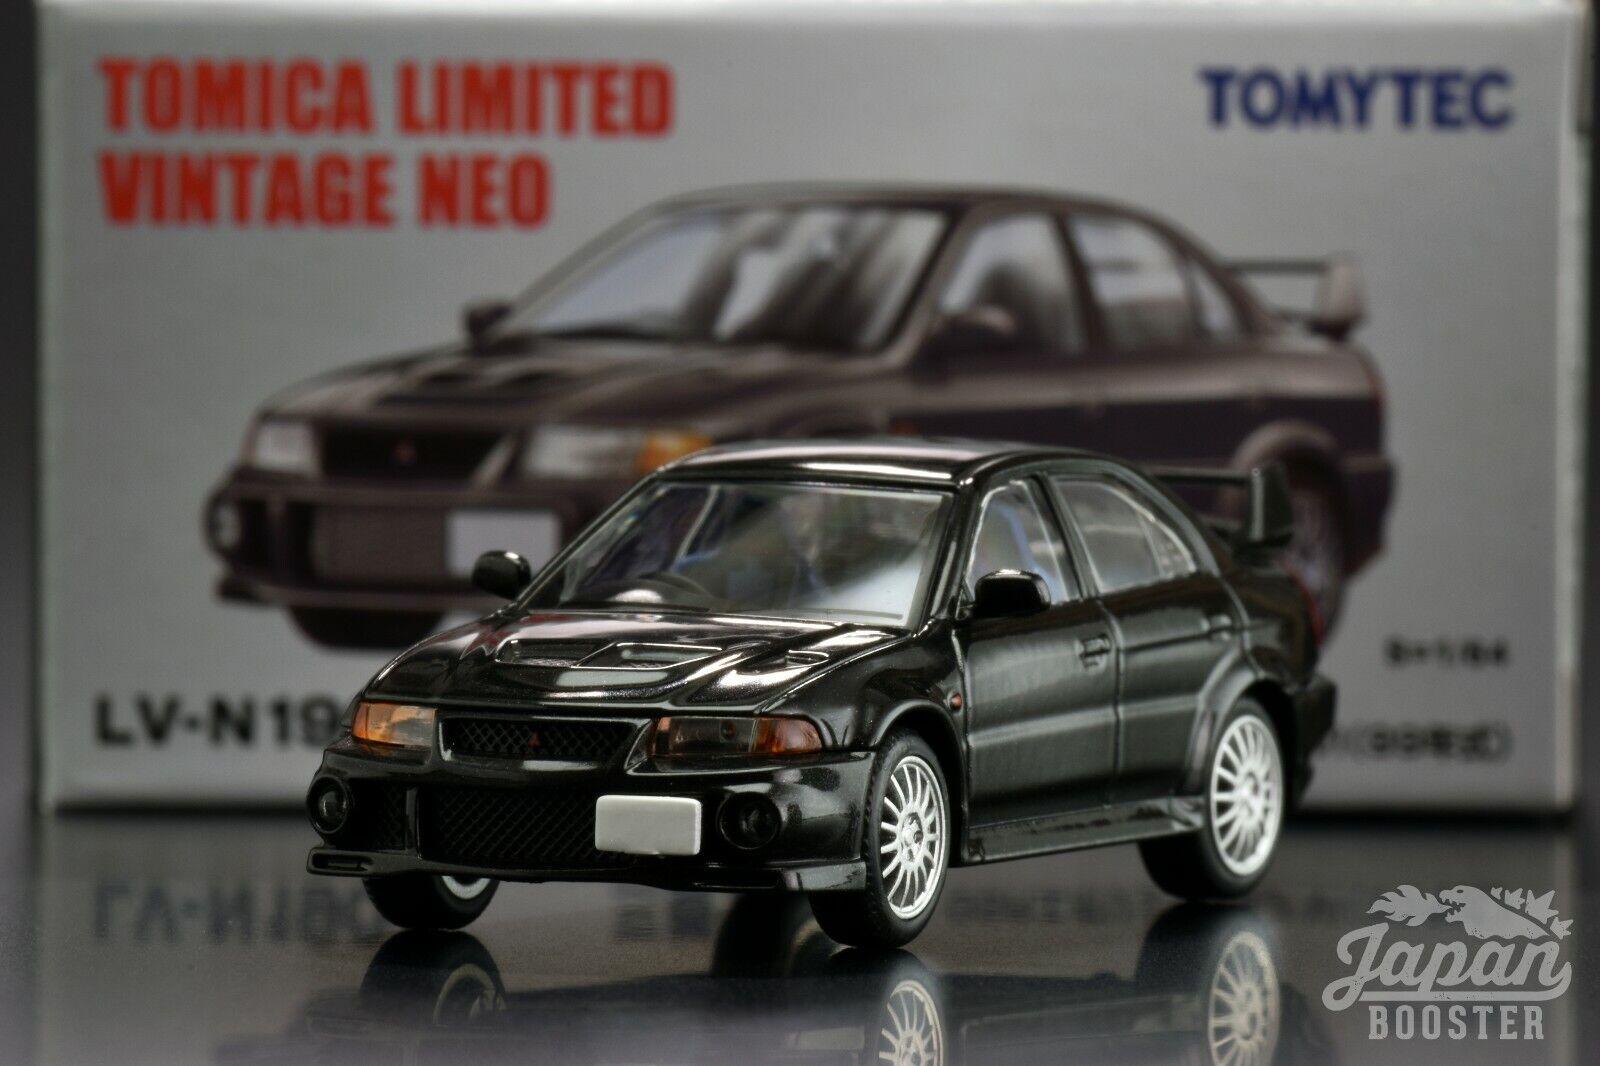 Tomica Limitierte Vintage Neo LV-N190b 1//64 Mitsubishi Lancer GSR Evolution 6